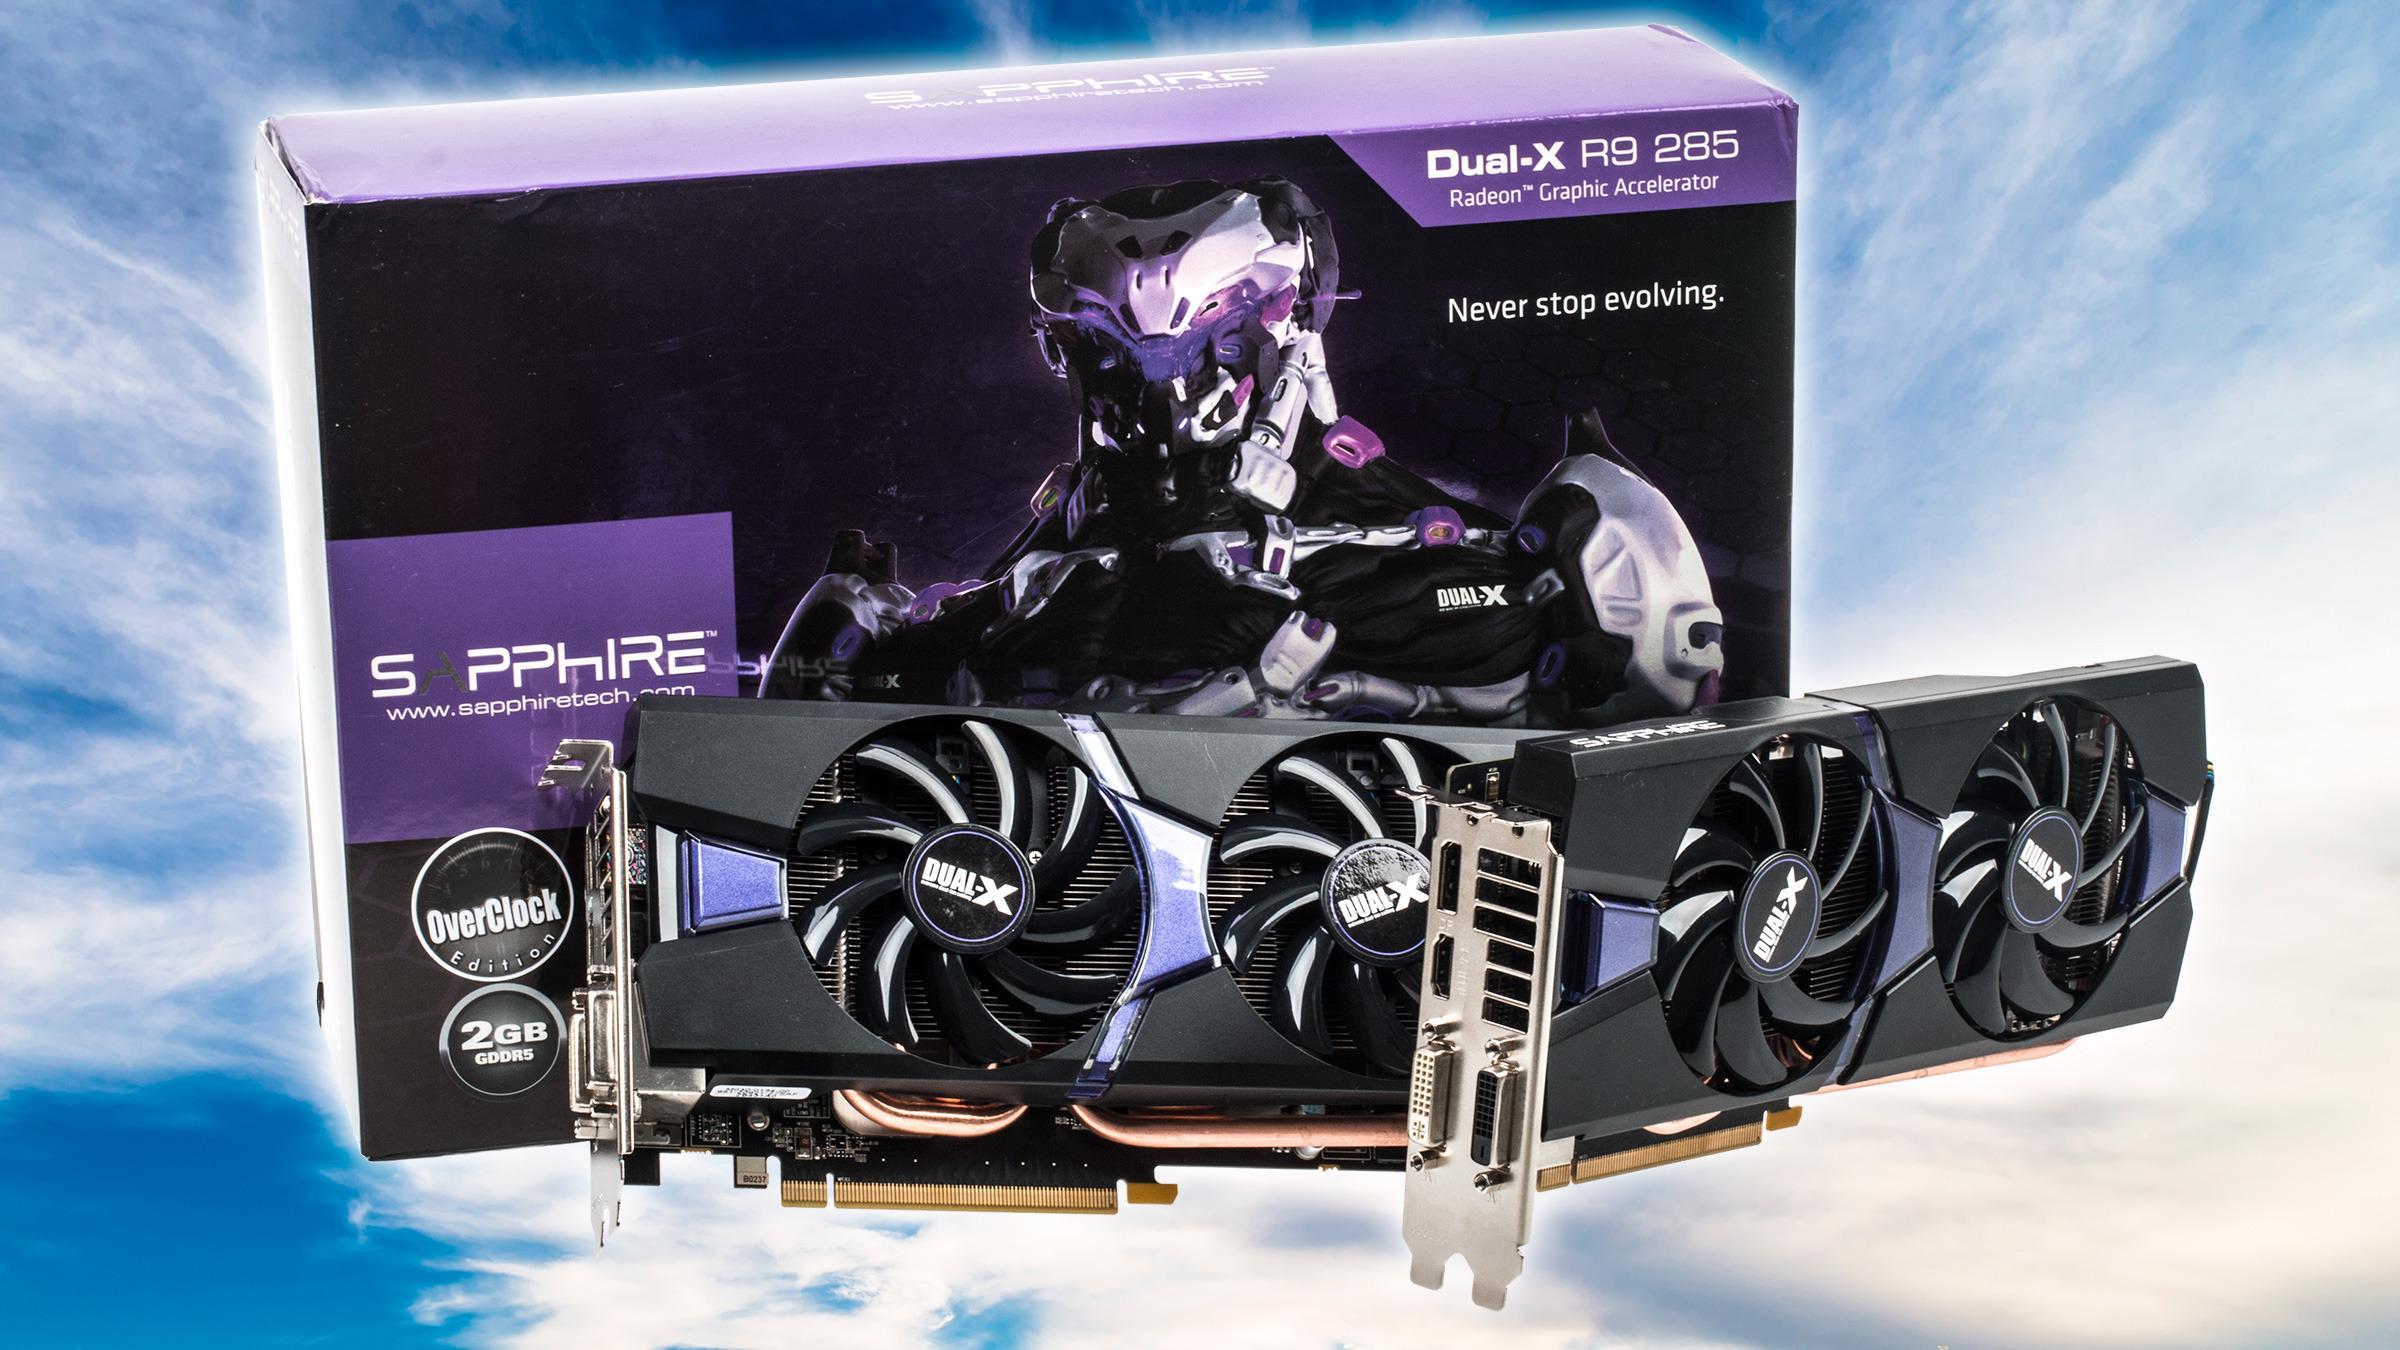 Sapphire Radeon R9 285 OC Dual-X 2 x Crossfire